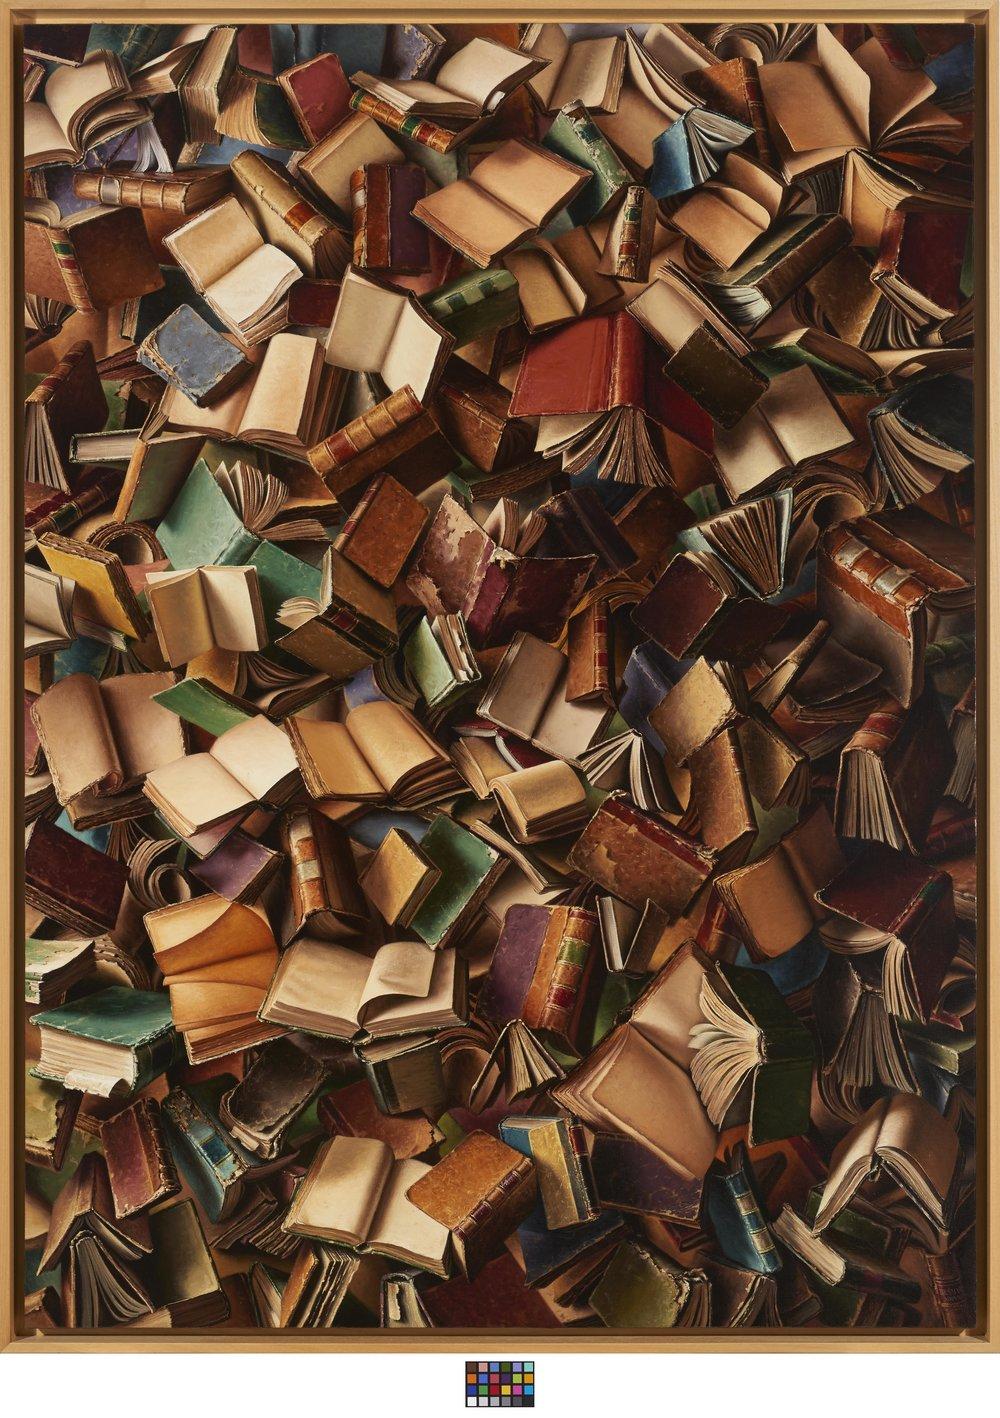 Joel Besmar, Cuban (Camagüey, Cuba, 1968 - ),  Descensus (The Descent),  2013, oil on canvas, 78 5/8 x 57 1/2 inches. Image courtesy of Modernism Inc., San Francisco.